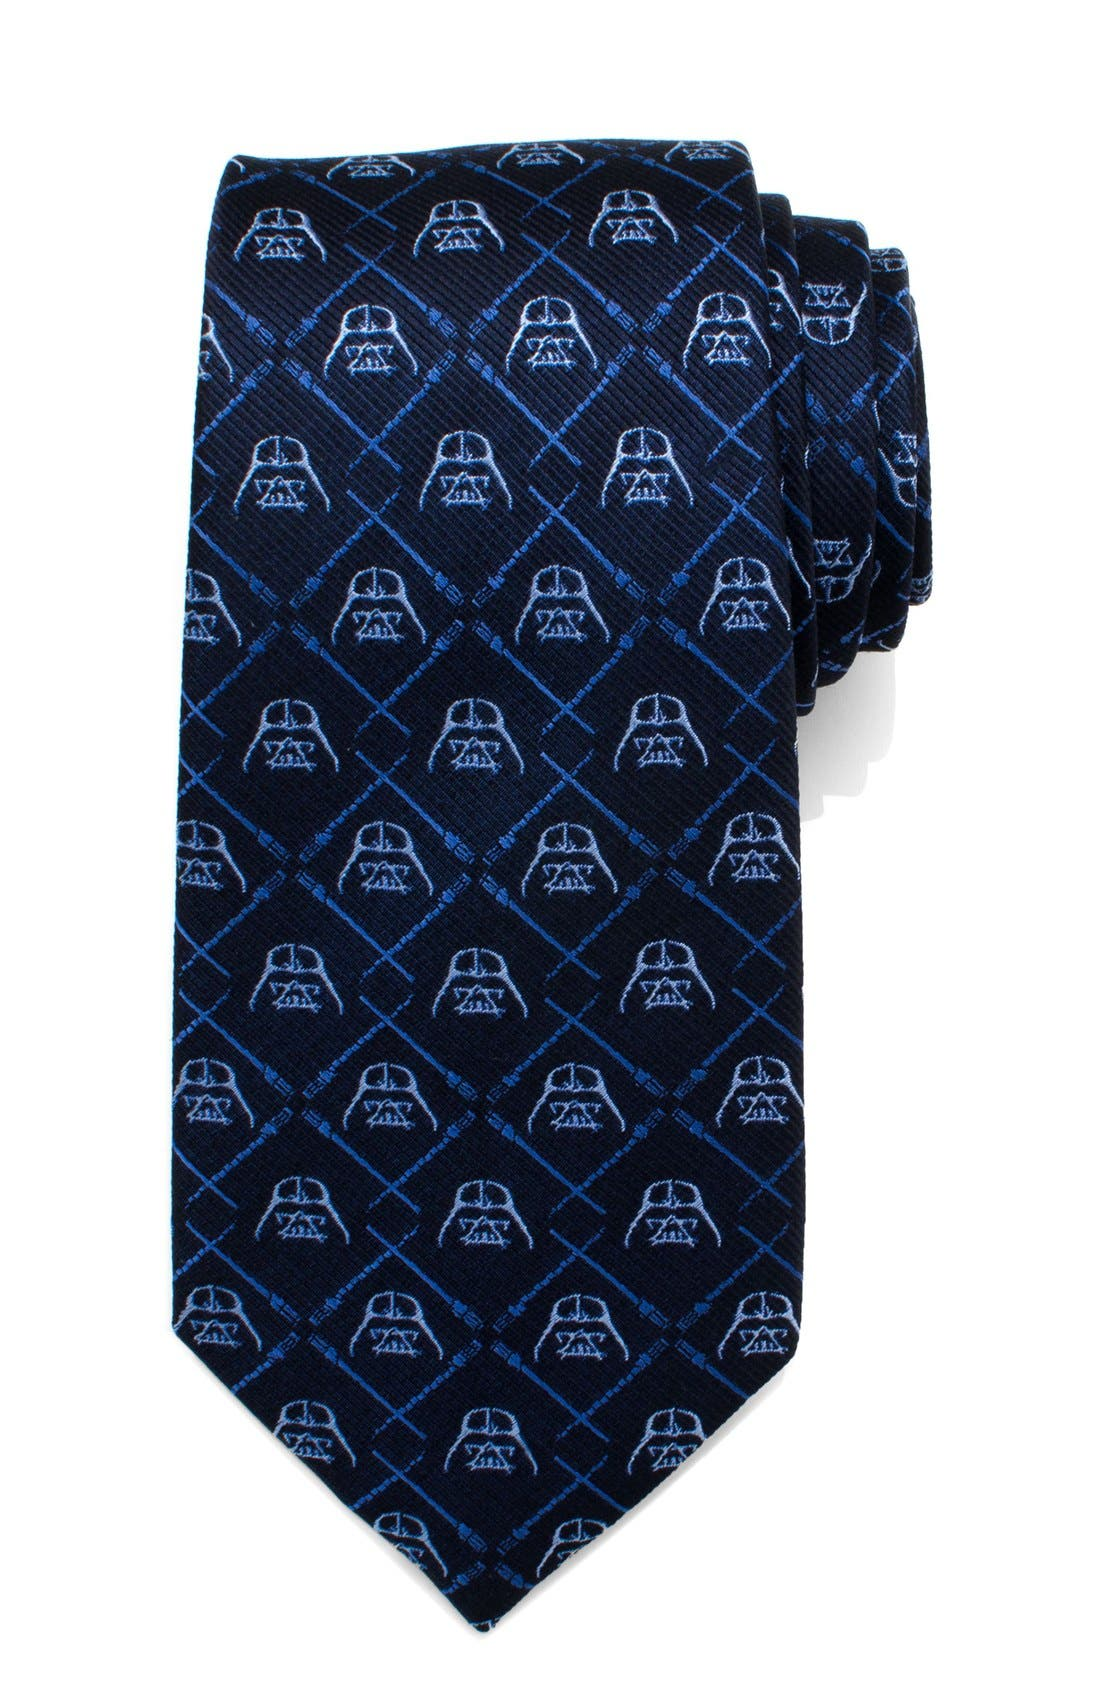 Cufflinks, Inc. 'Darth Vader' Silk Tie